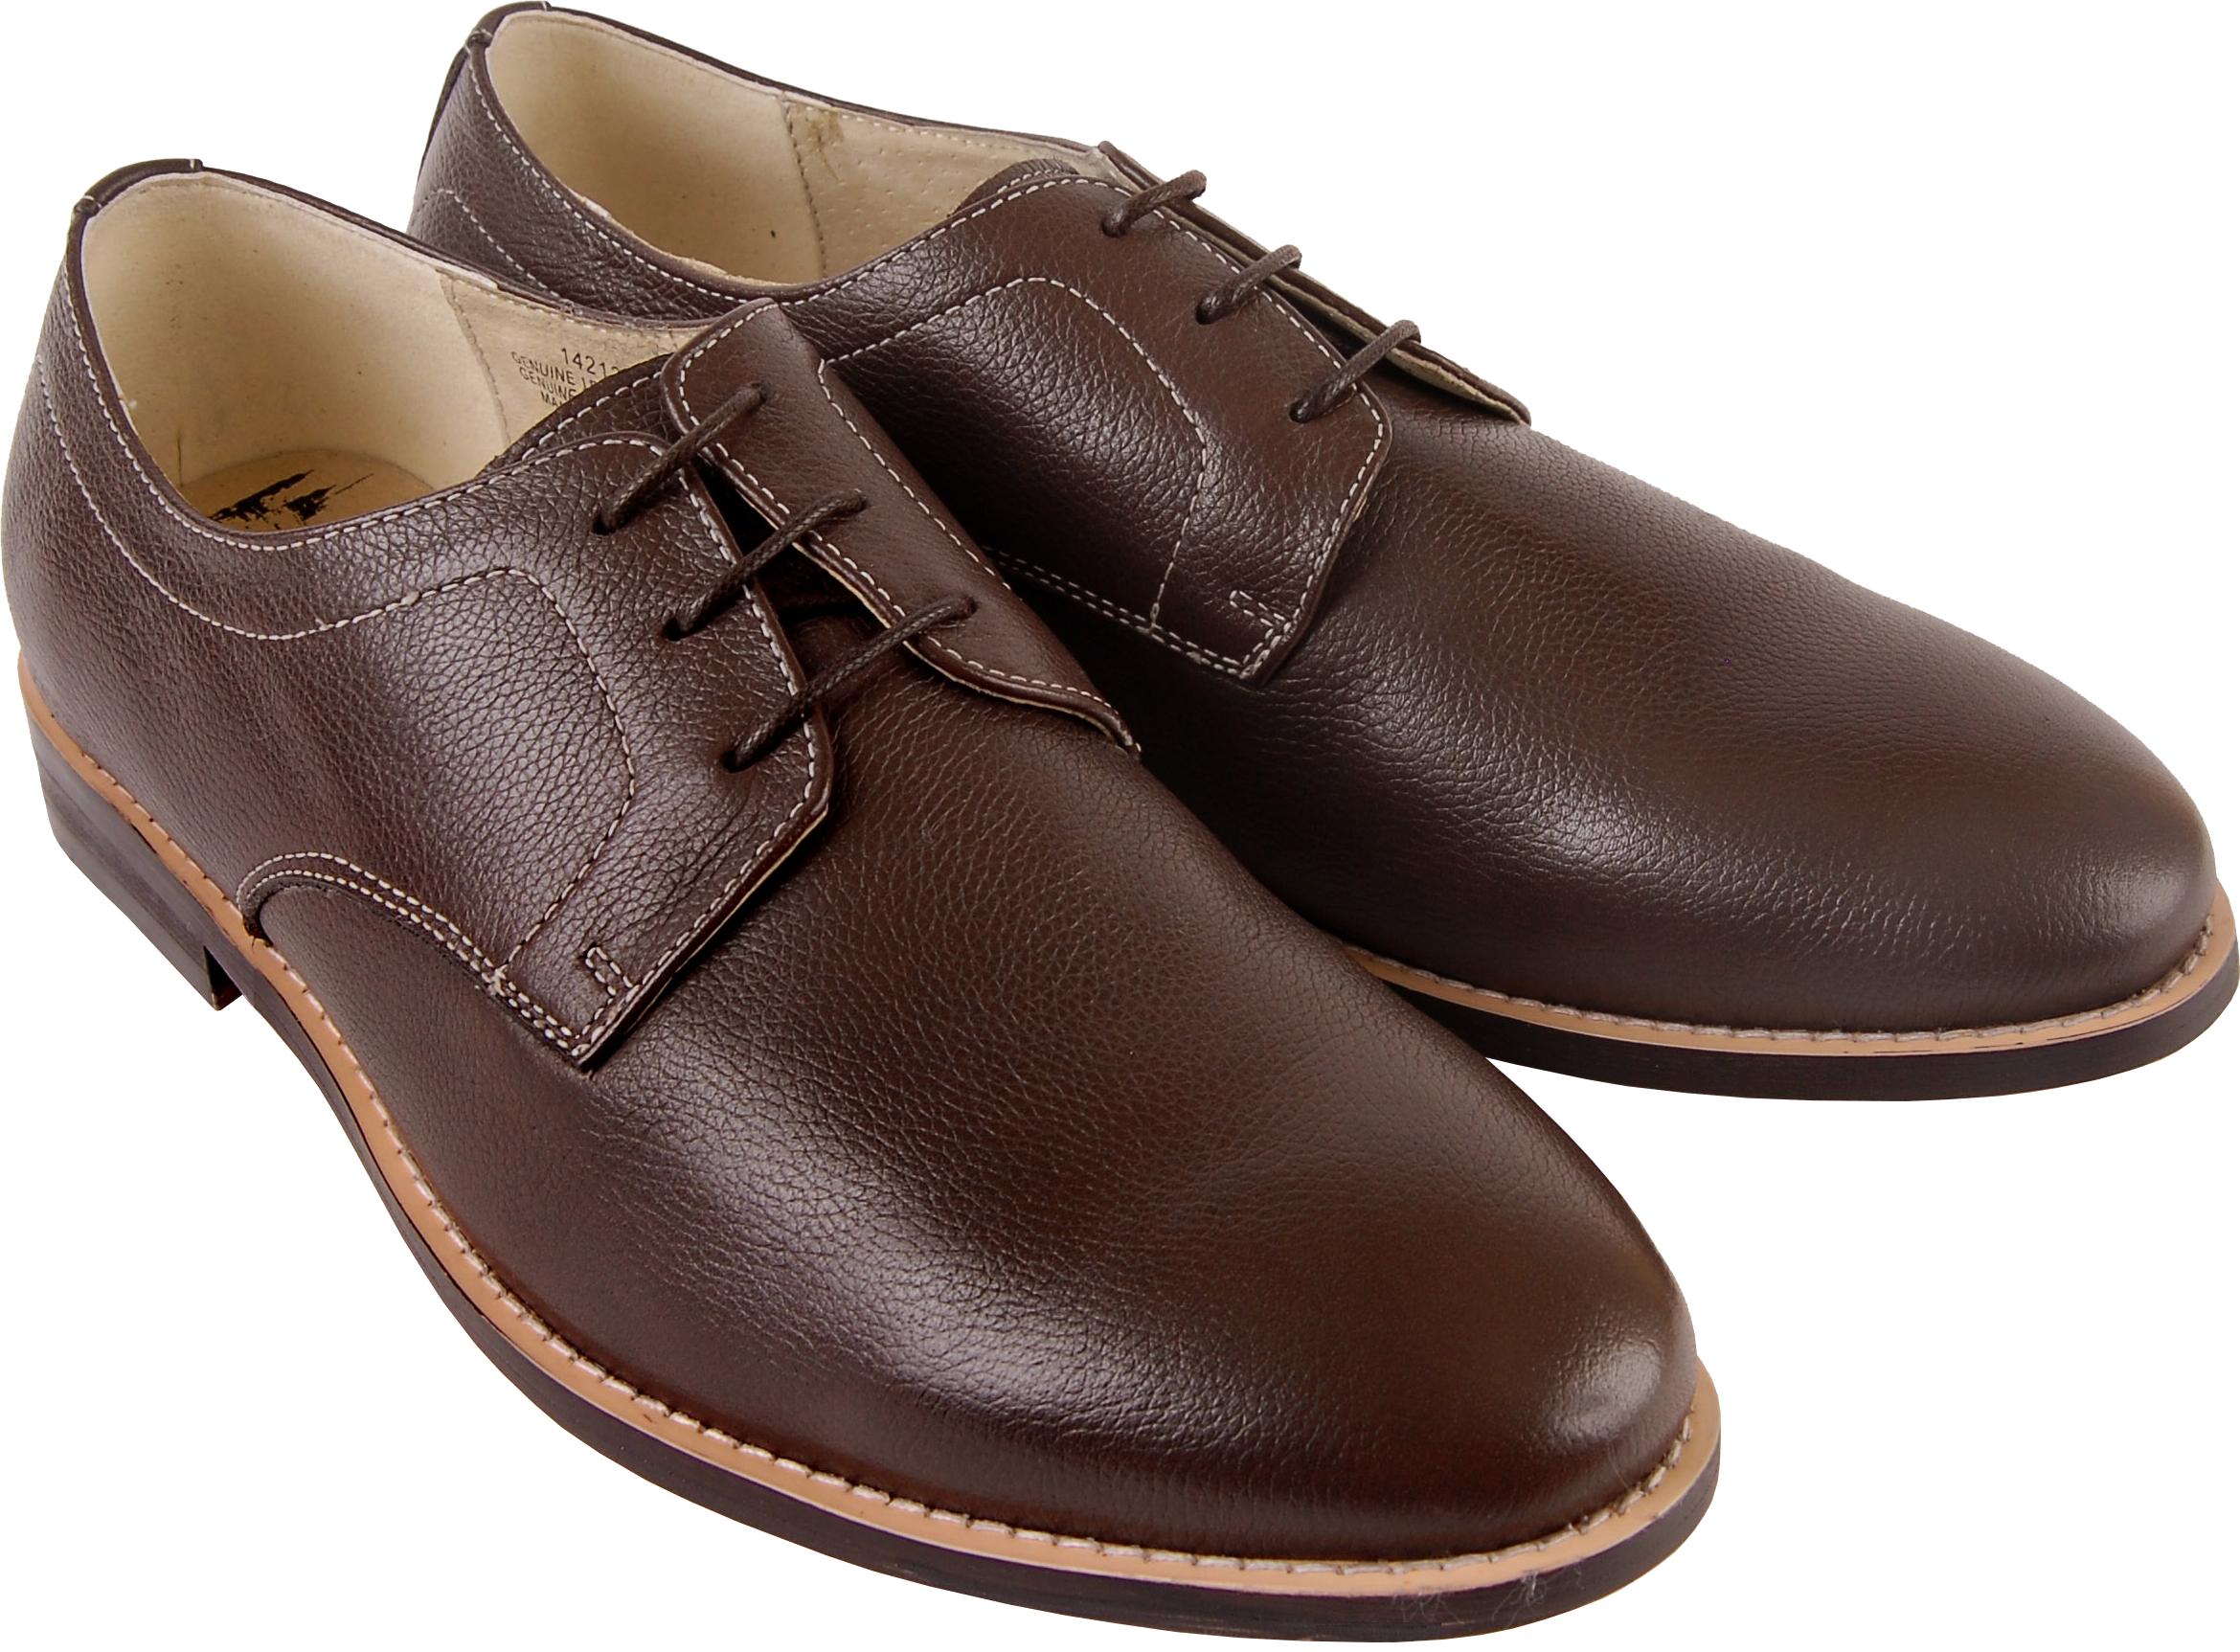 Brown men shoes PNG image - Shoes PNG